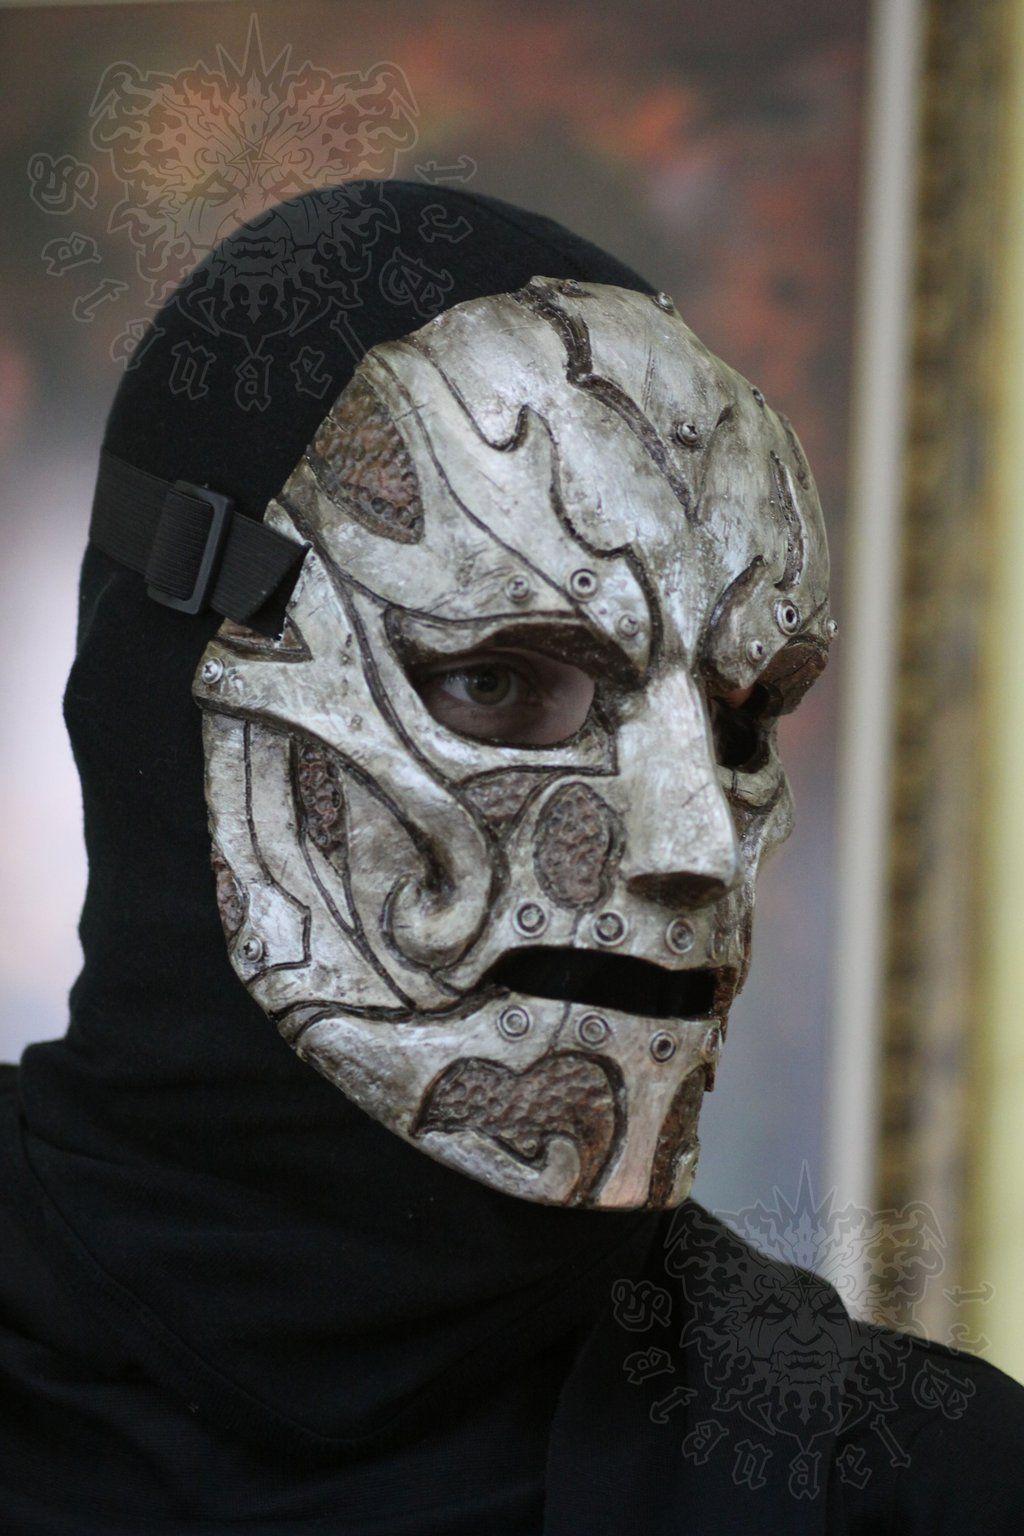 Dr.Doom by Psychopat6666.deviantart.com on @DeviantArt | Masks ...